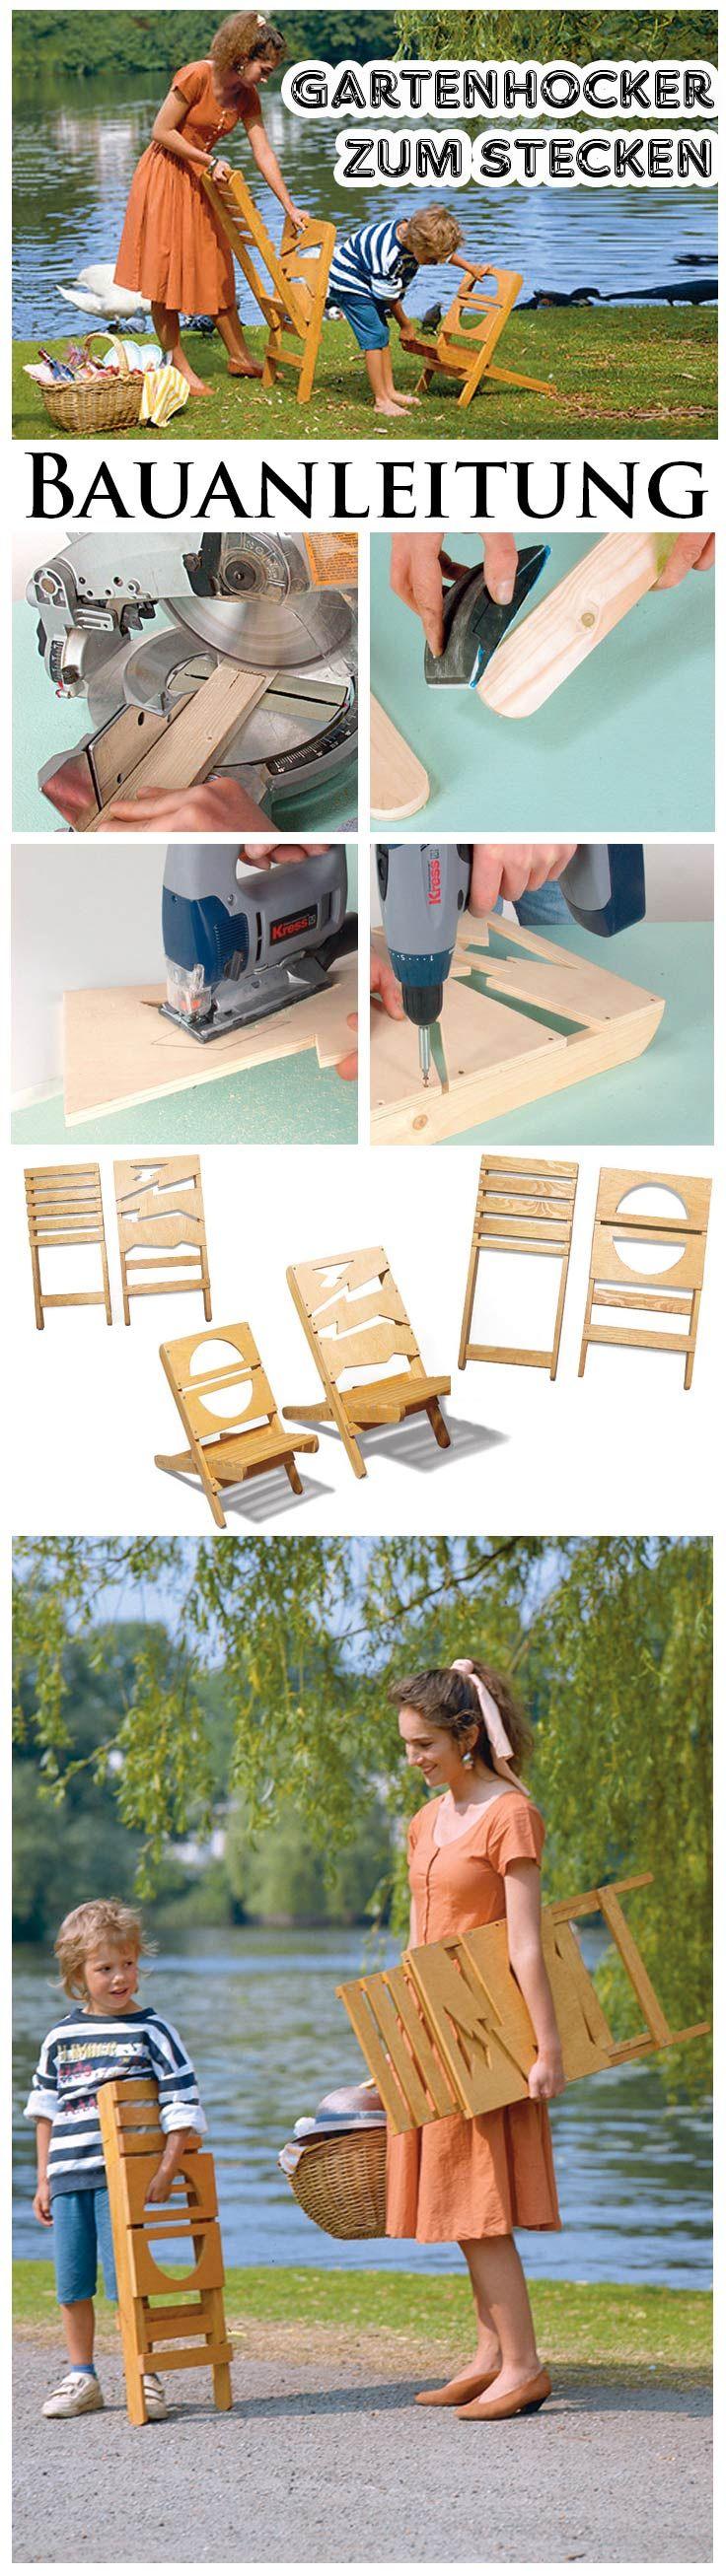 Lovely Garten Ideen Hocker Klappstuhl Holz Wir Diy M bel Diy Projekte Selber Bauen Holzarbeiten Schweden